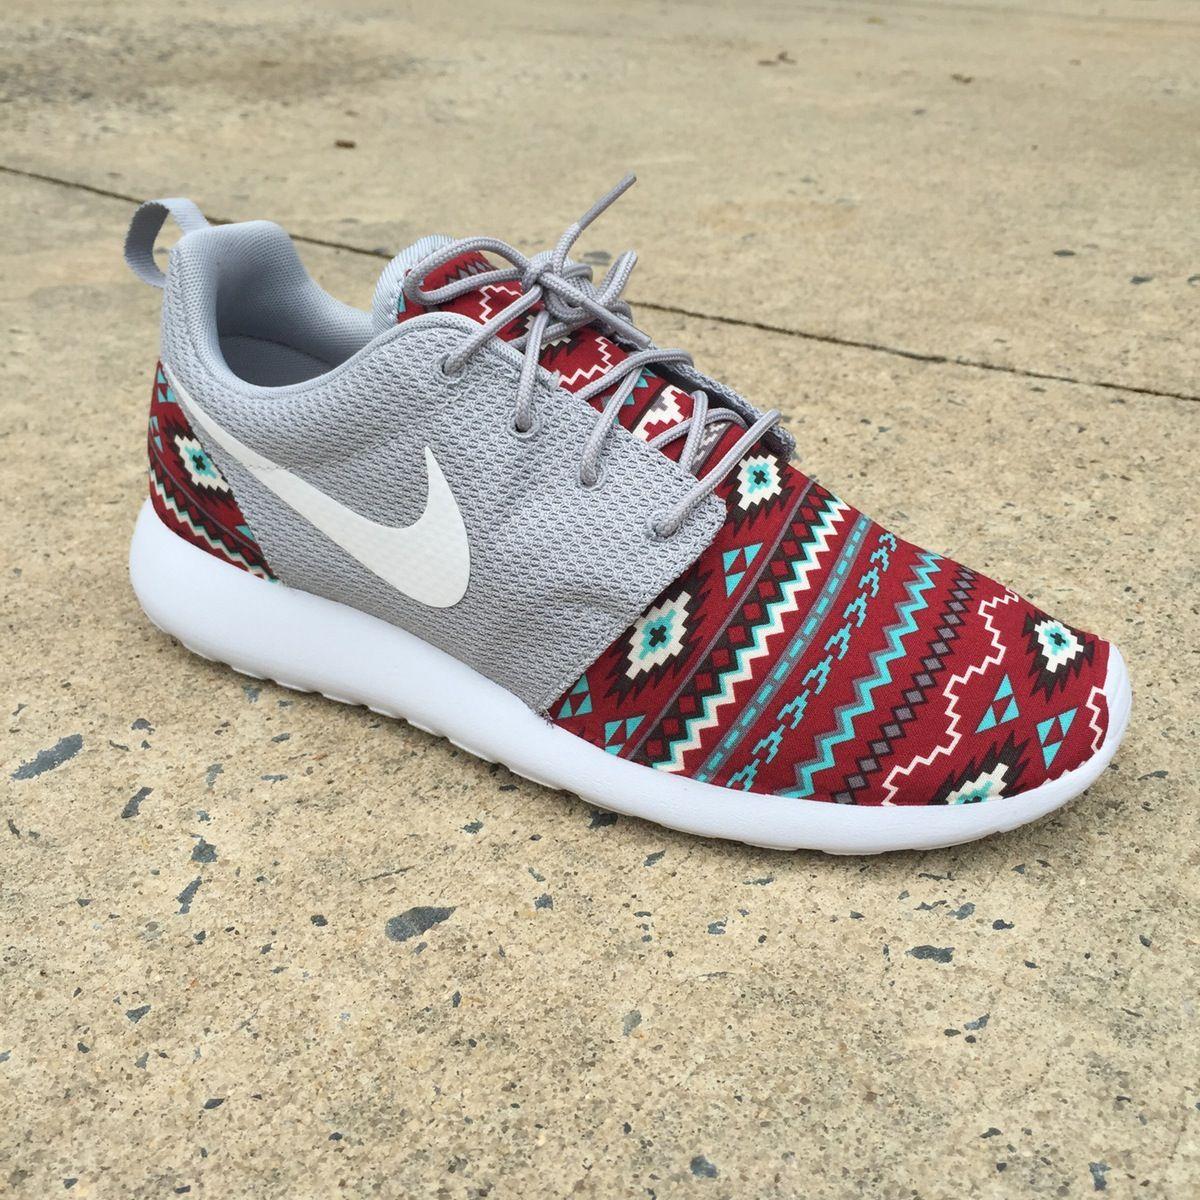 5569e0886da1 Brand New Authentic Nike Roshe Run Custom which features a